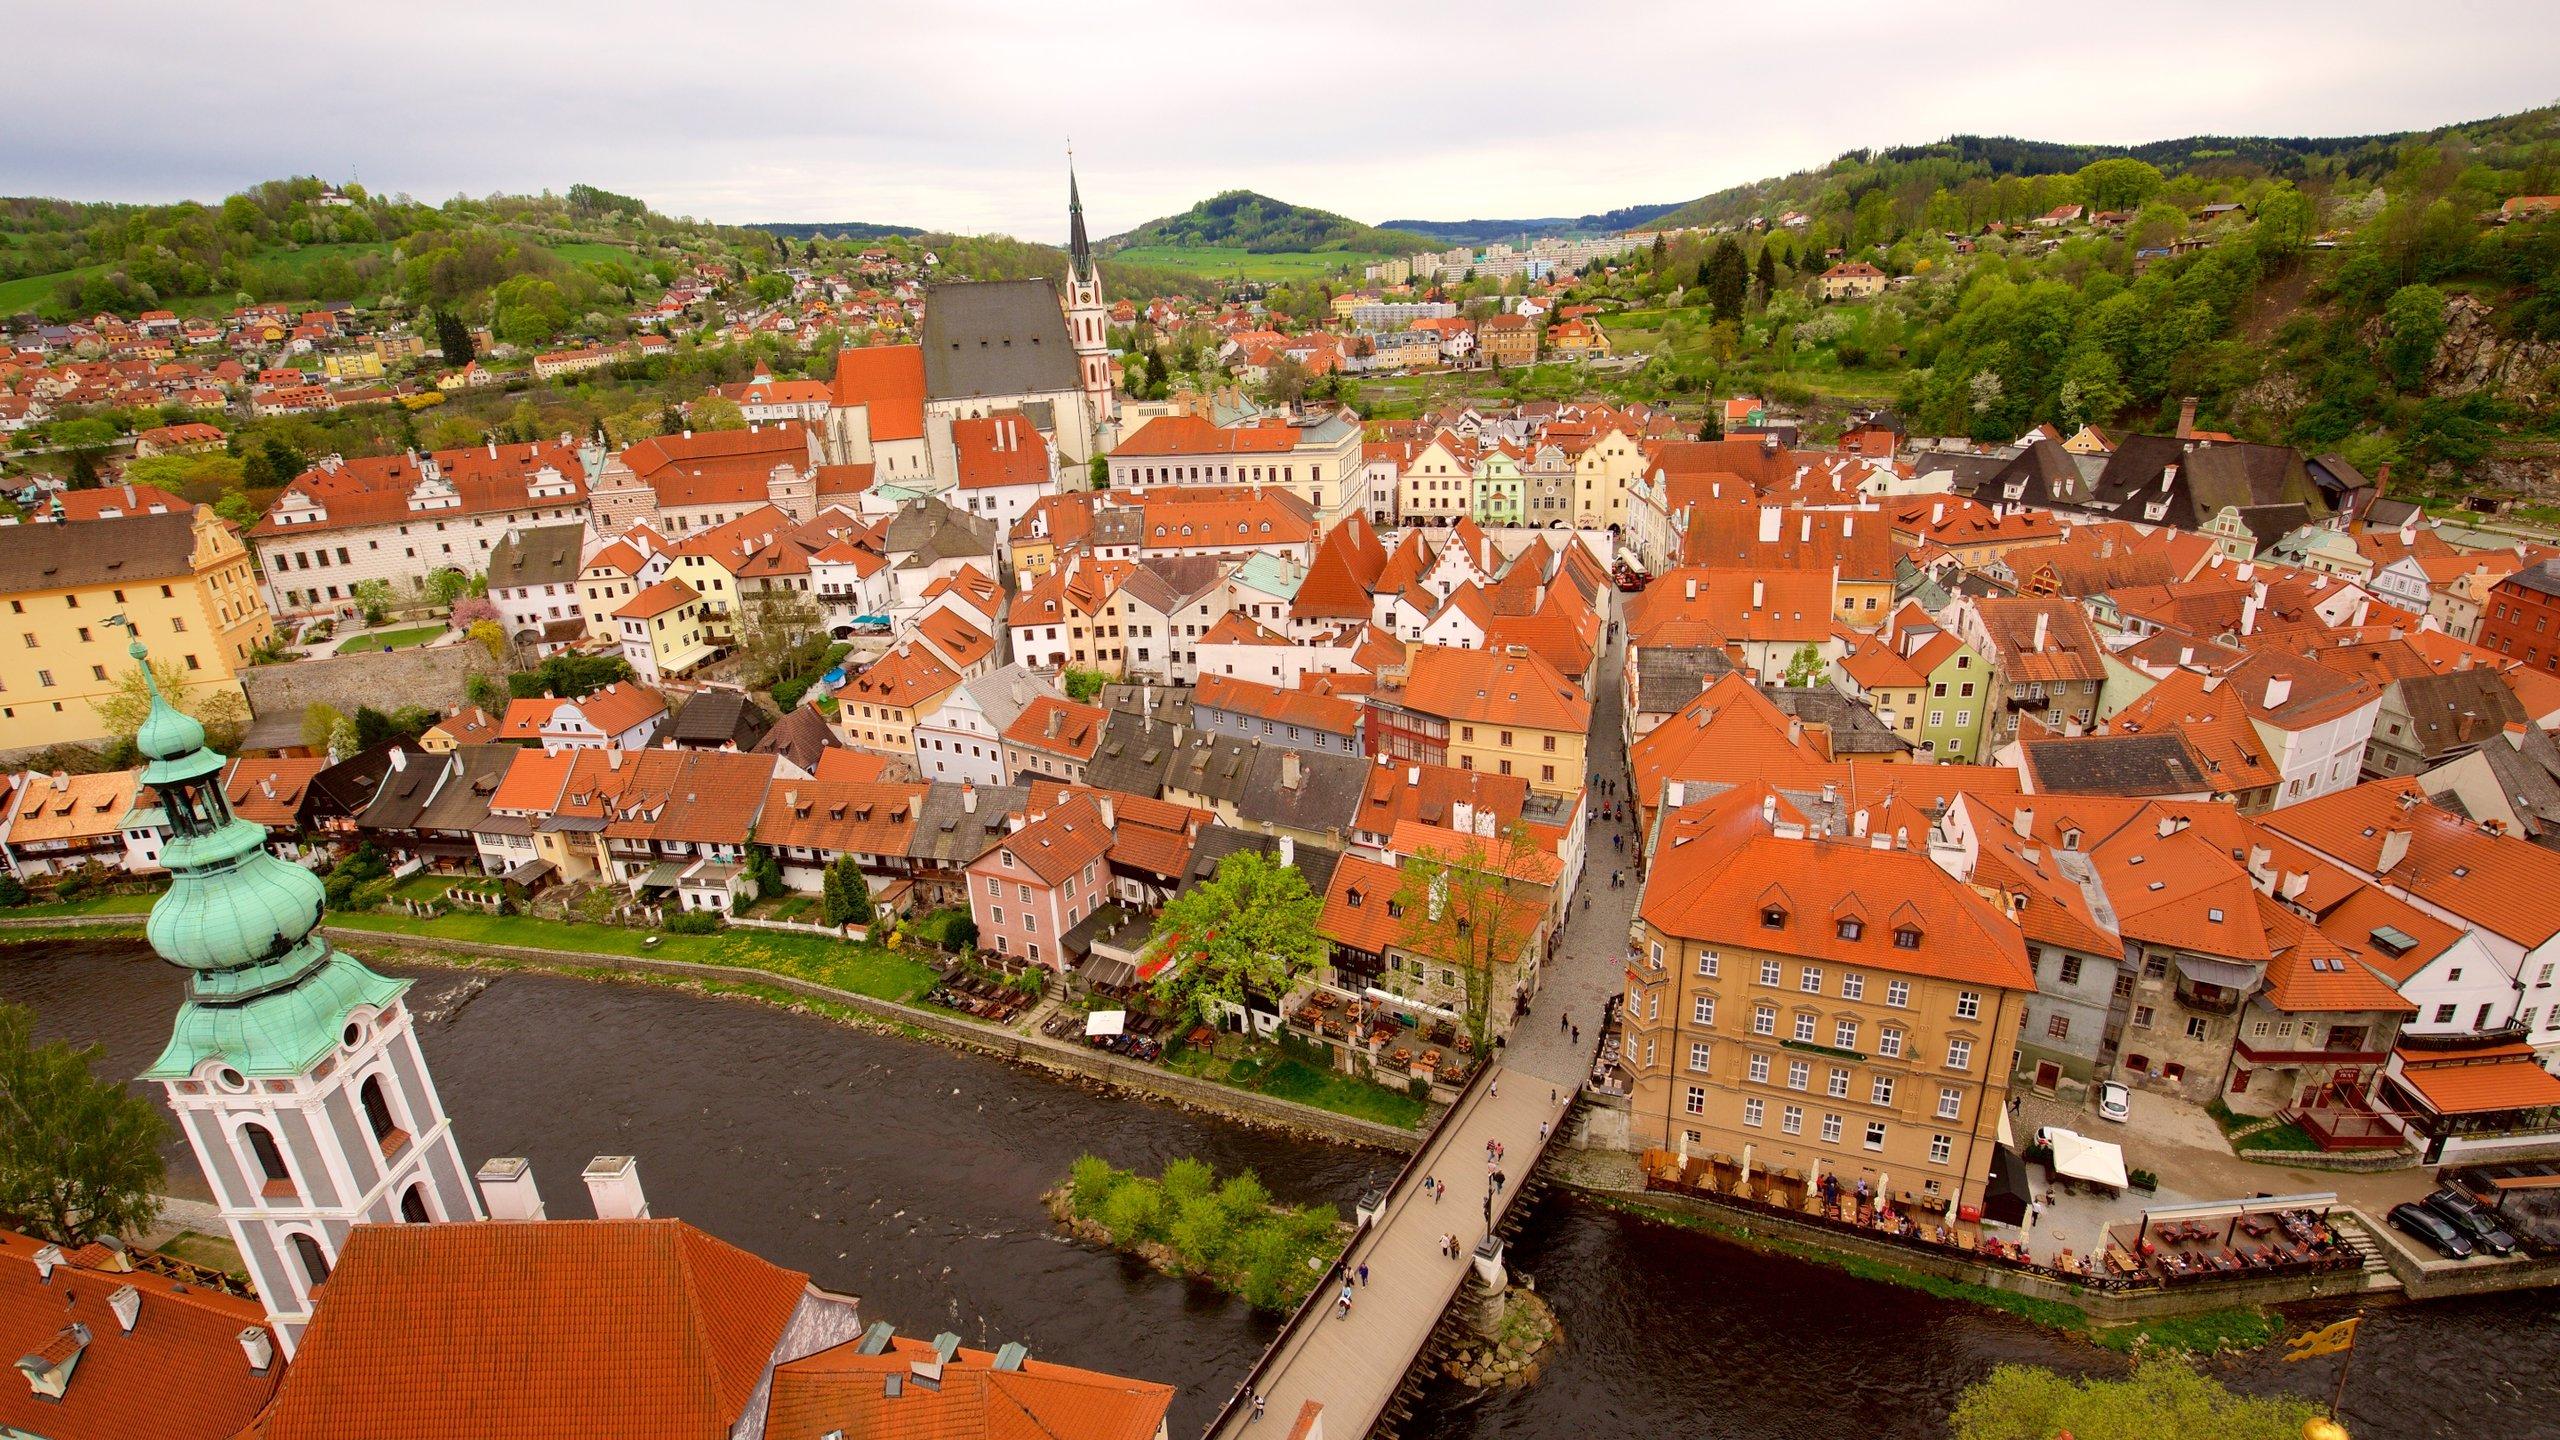 Cesky Krumlov, South Bohemia Region, Czech Republic